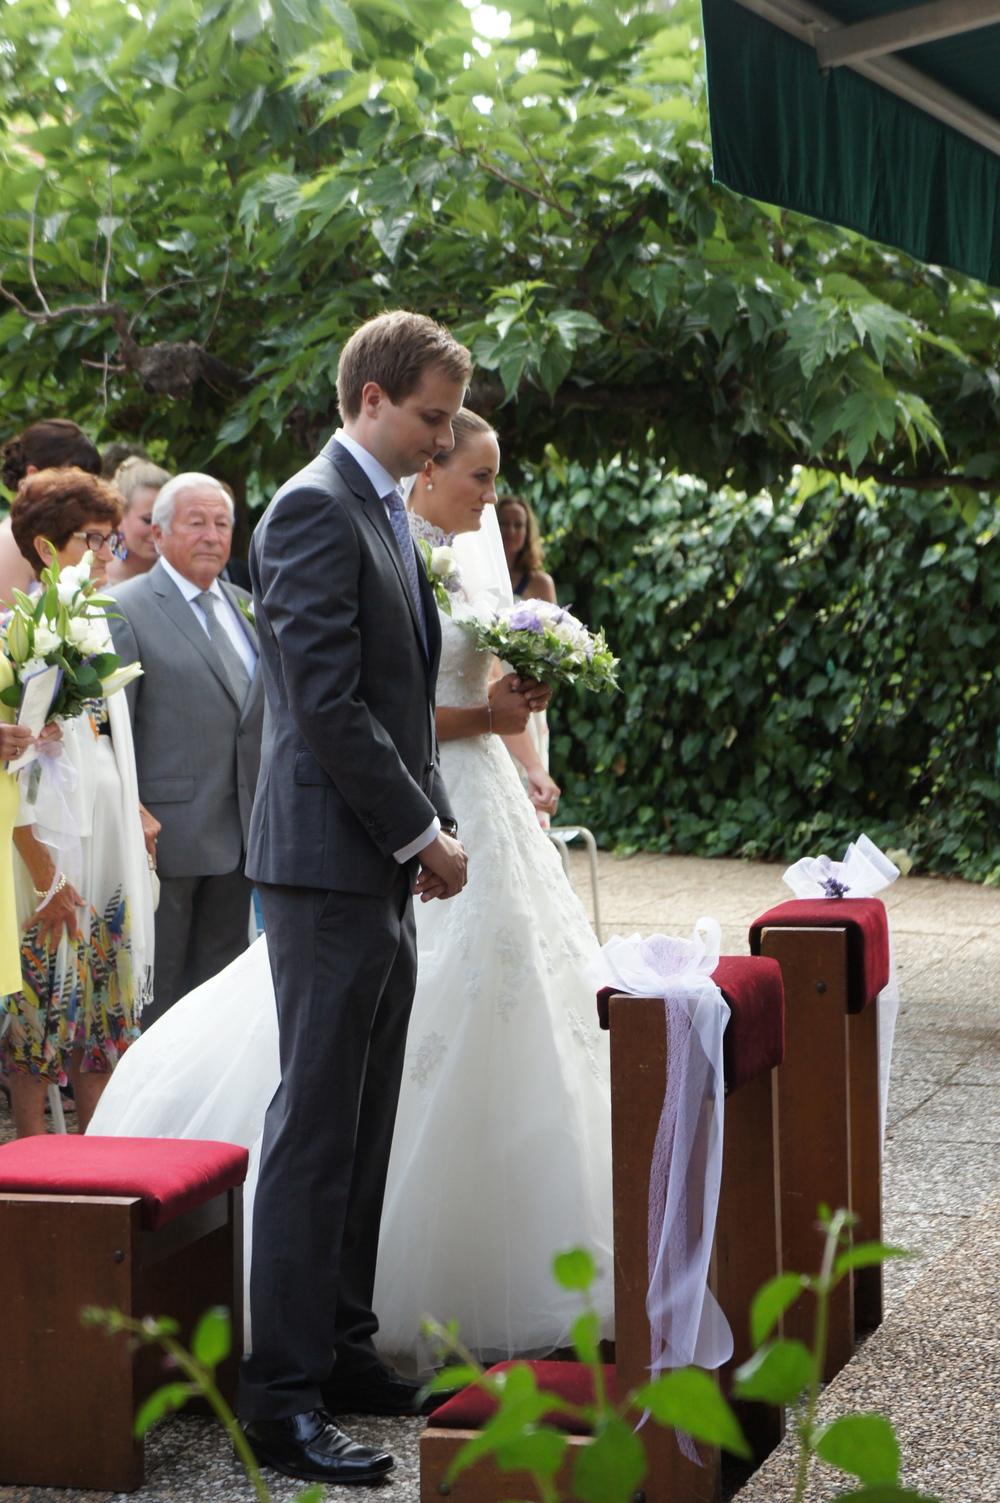 Kendra & Torbjorn Ceremony